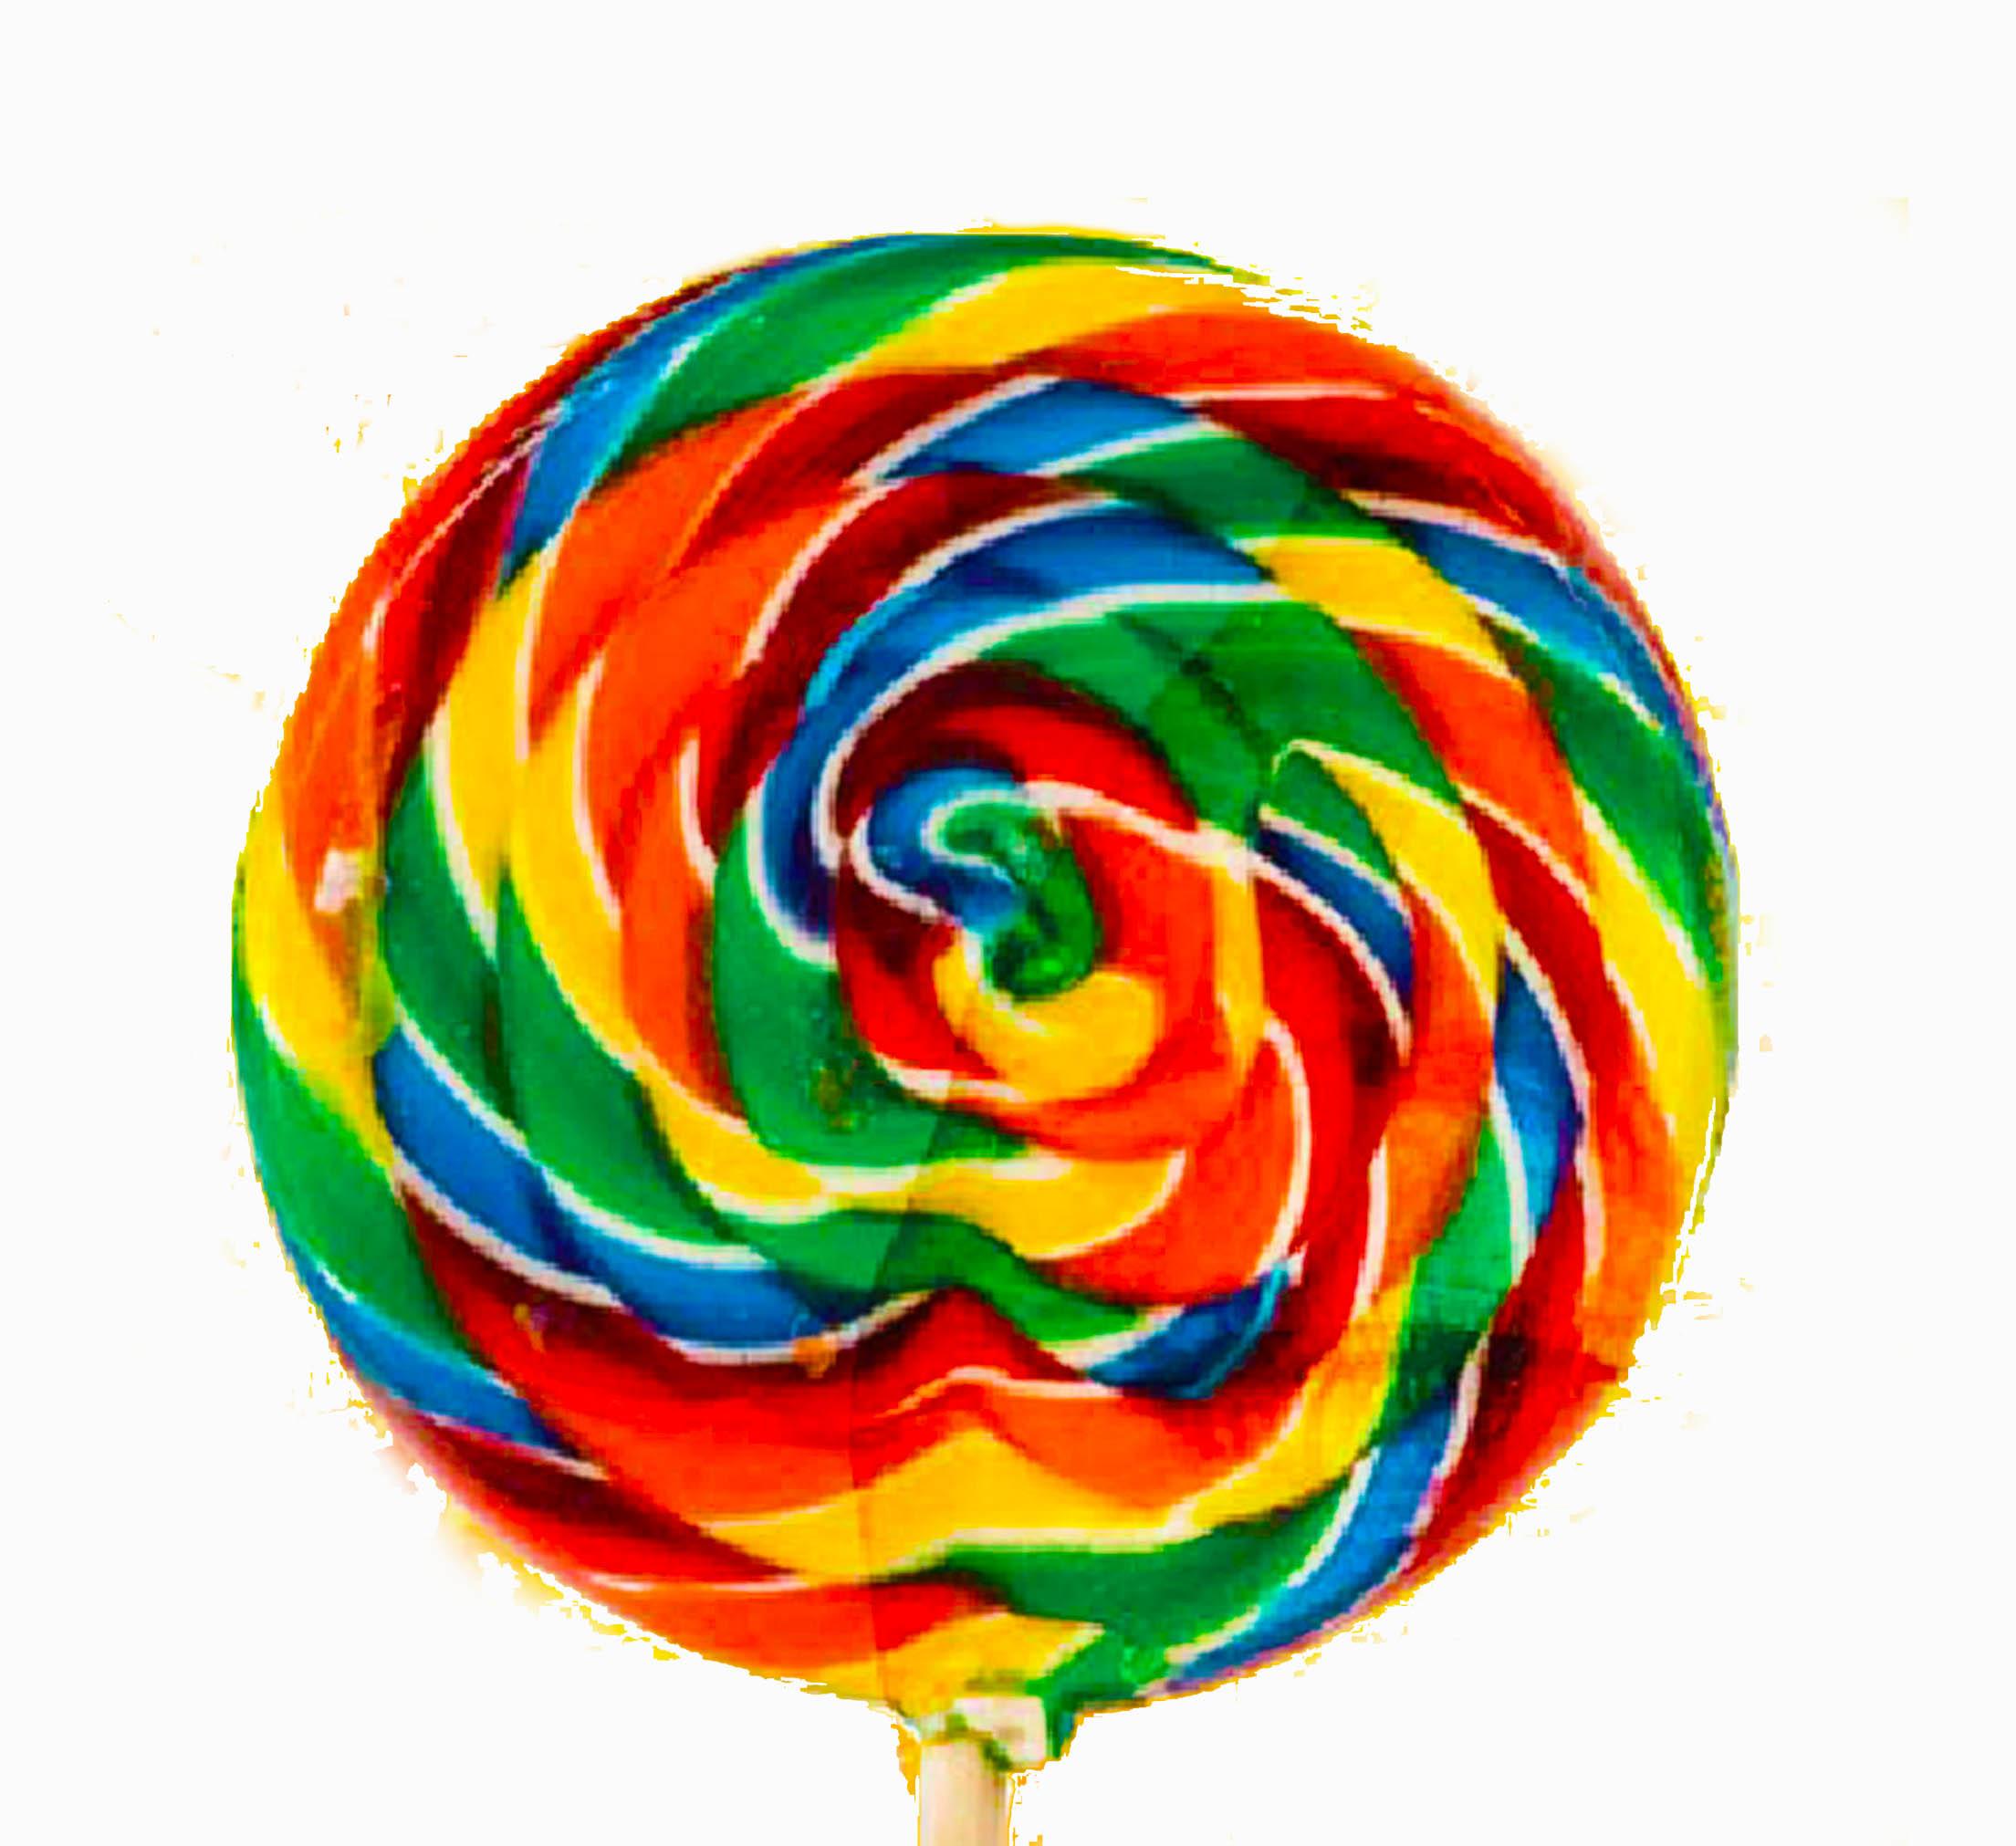 Swirl clip art library. Lollipop clipart large lollipop